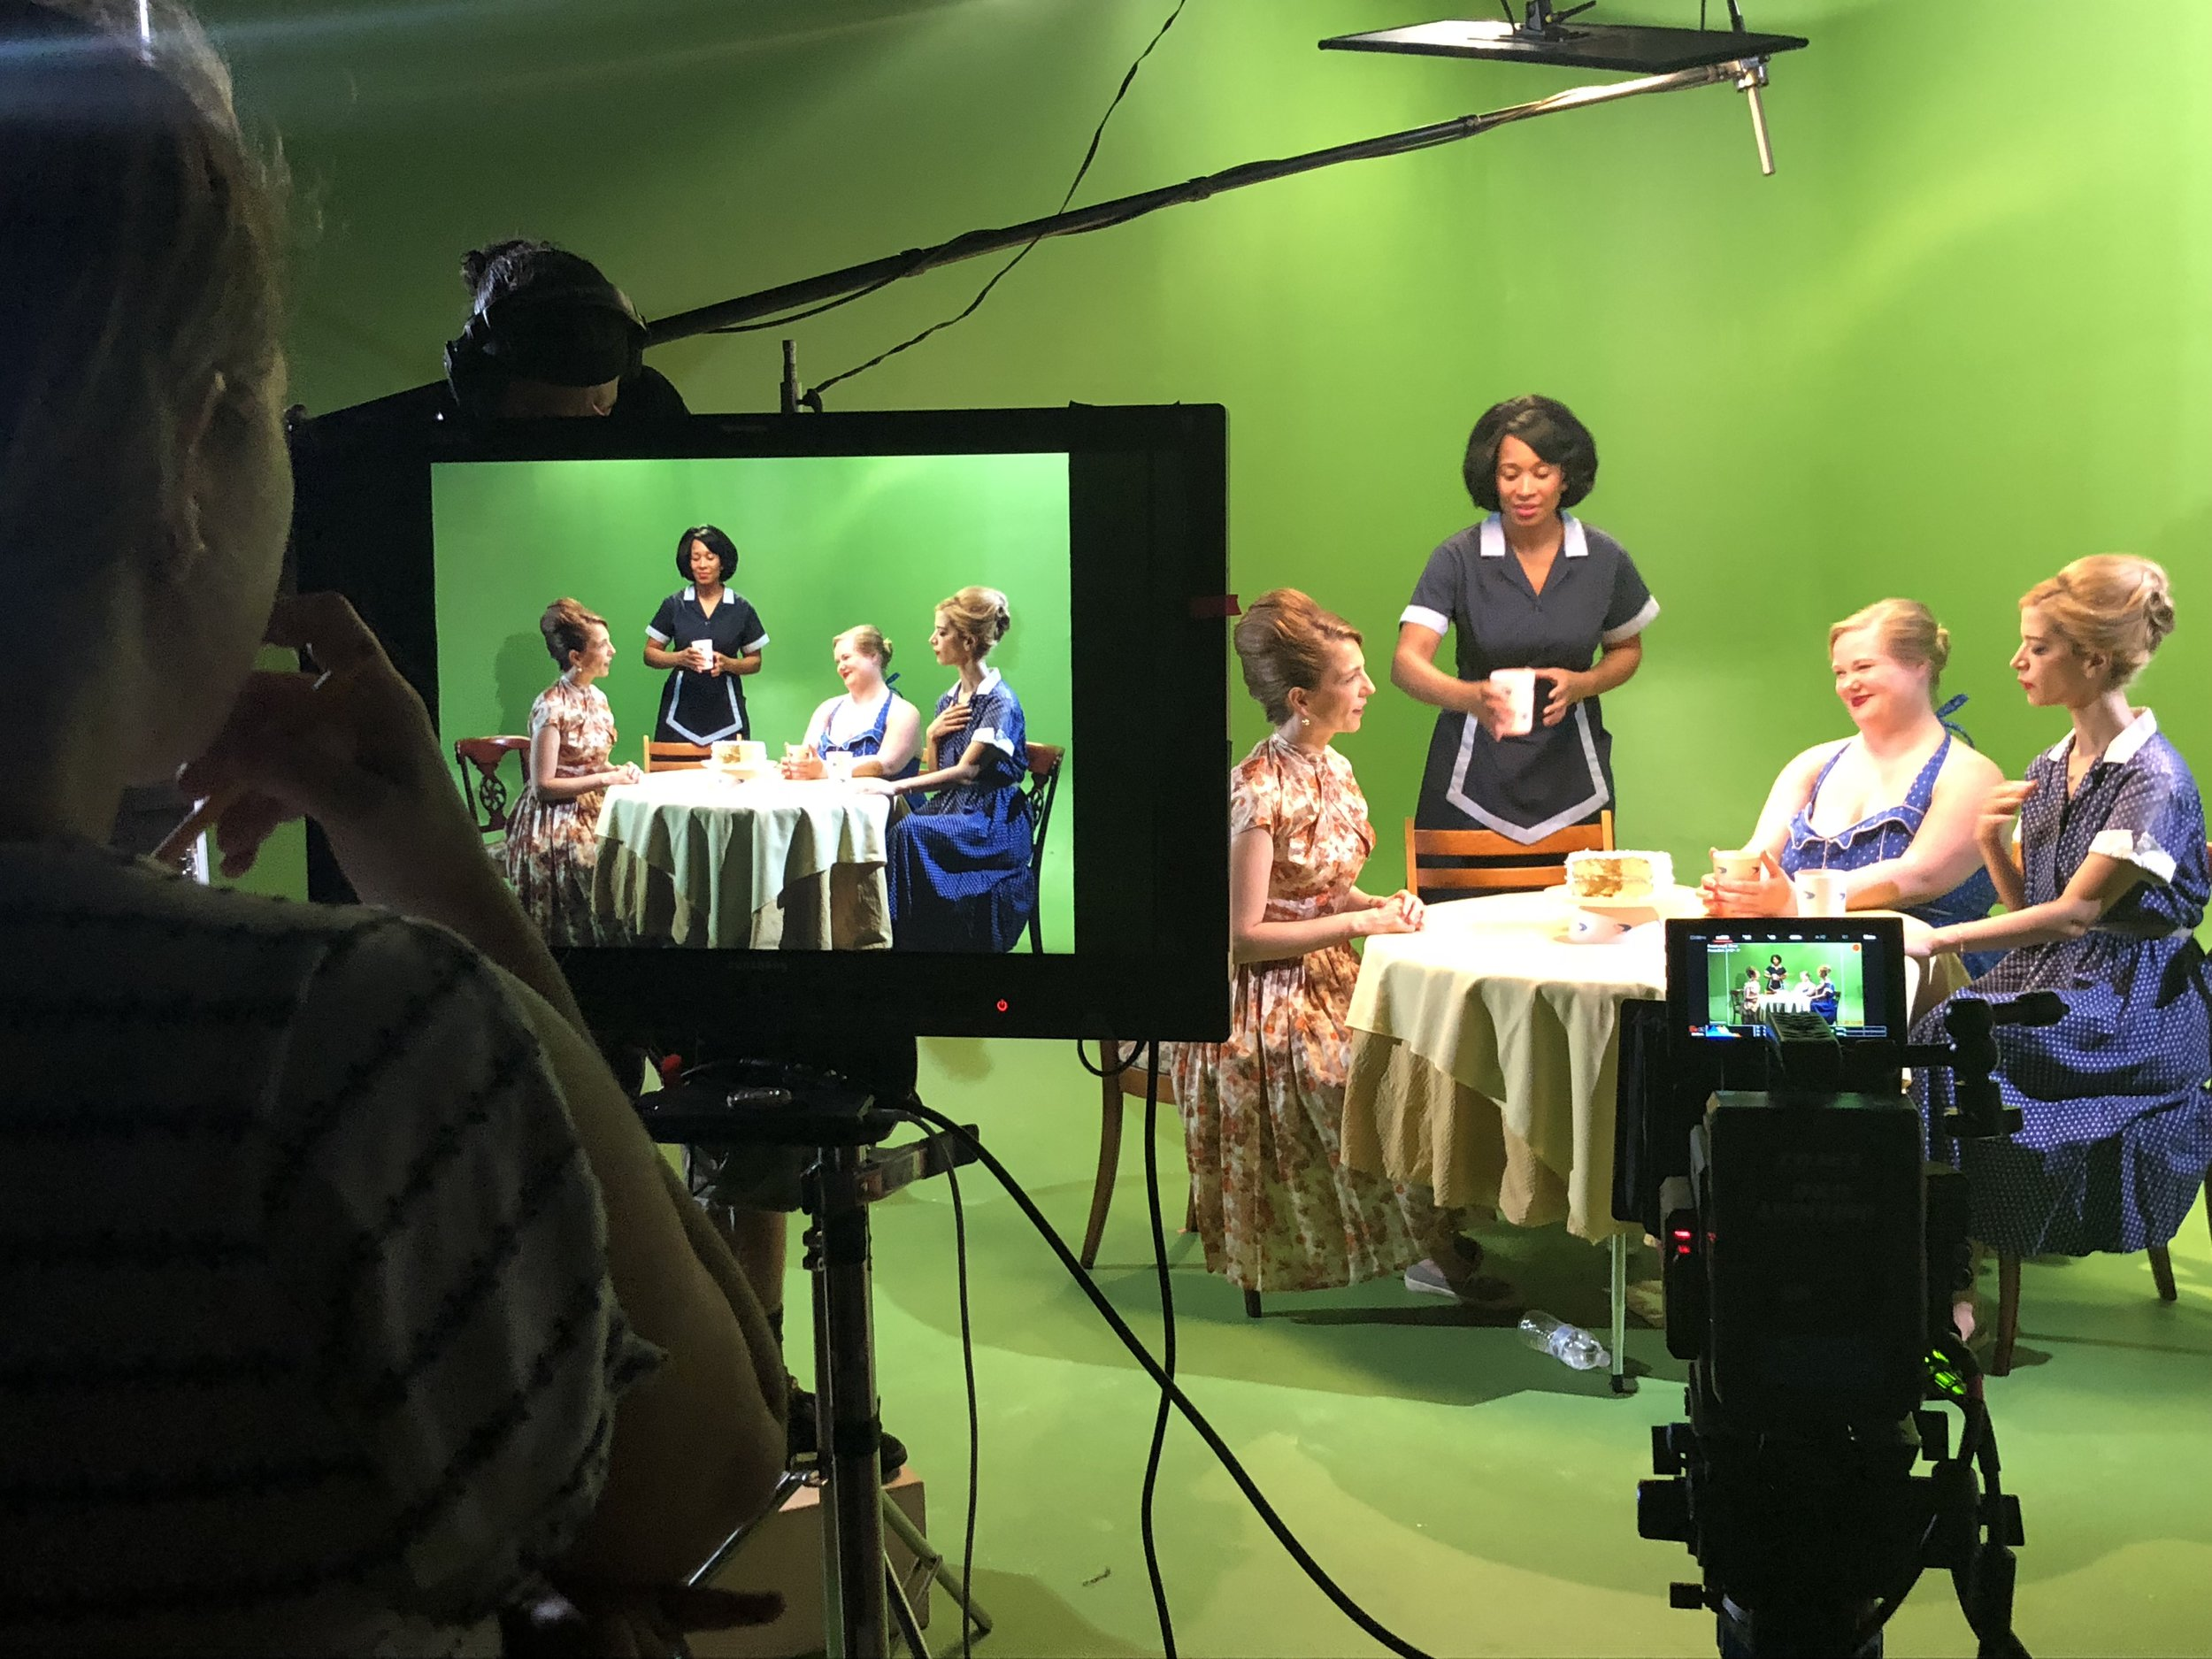 On set filming  Beckys Through History . L-R: Jessica Daniels (director), Eevin Hartsough,Malikha Mallet, Jen Ponton, Ilana Becker.